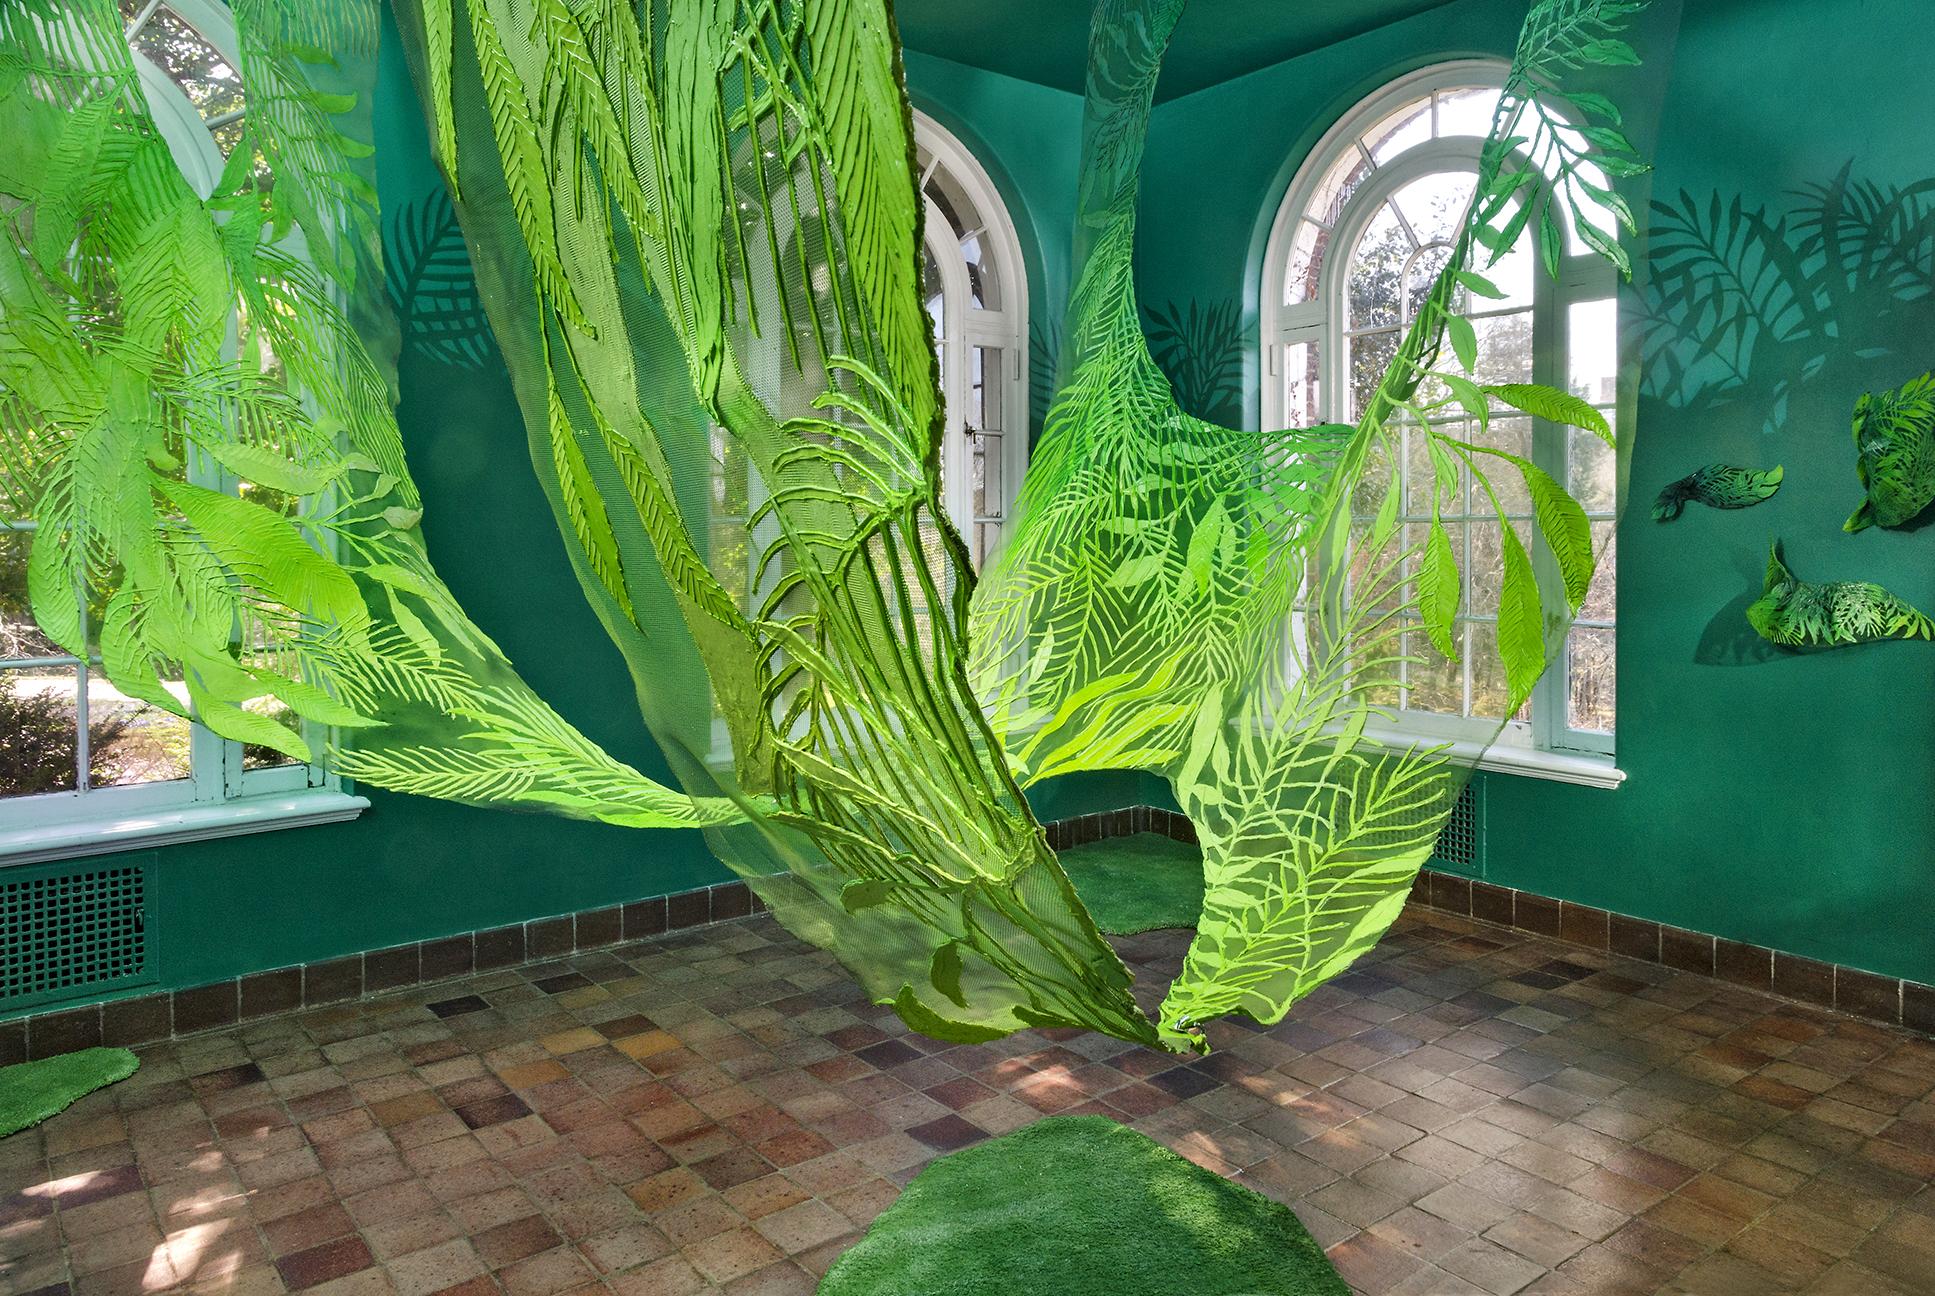 01c Tarver WH Sunroom Installation View.jpg